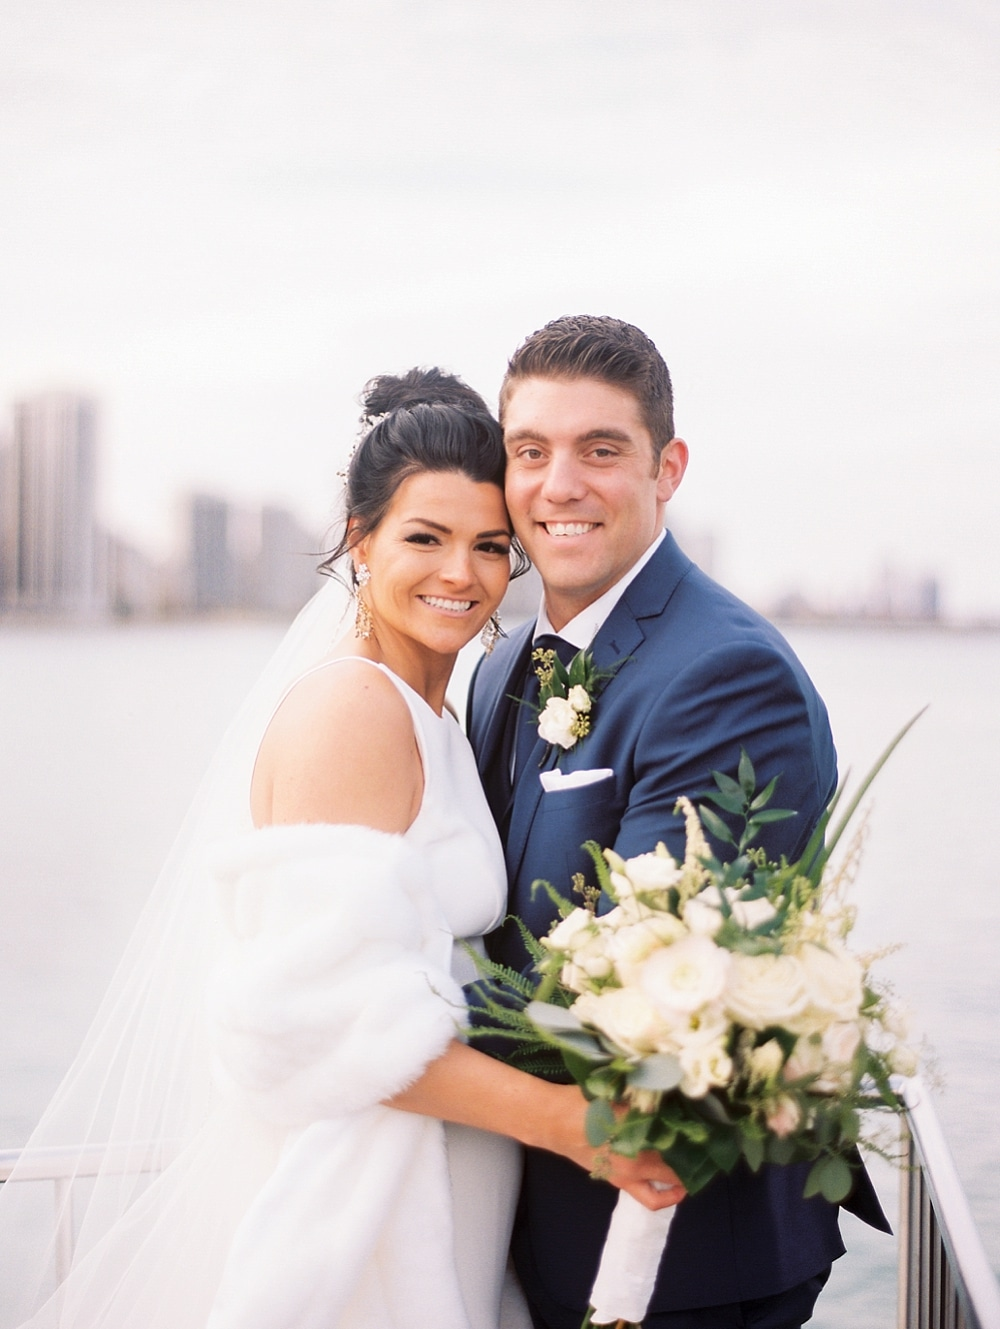 Kristin-La-Voie-Photography-chicago-wedding-photographer-122